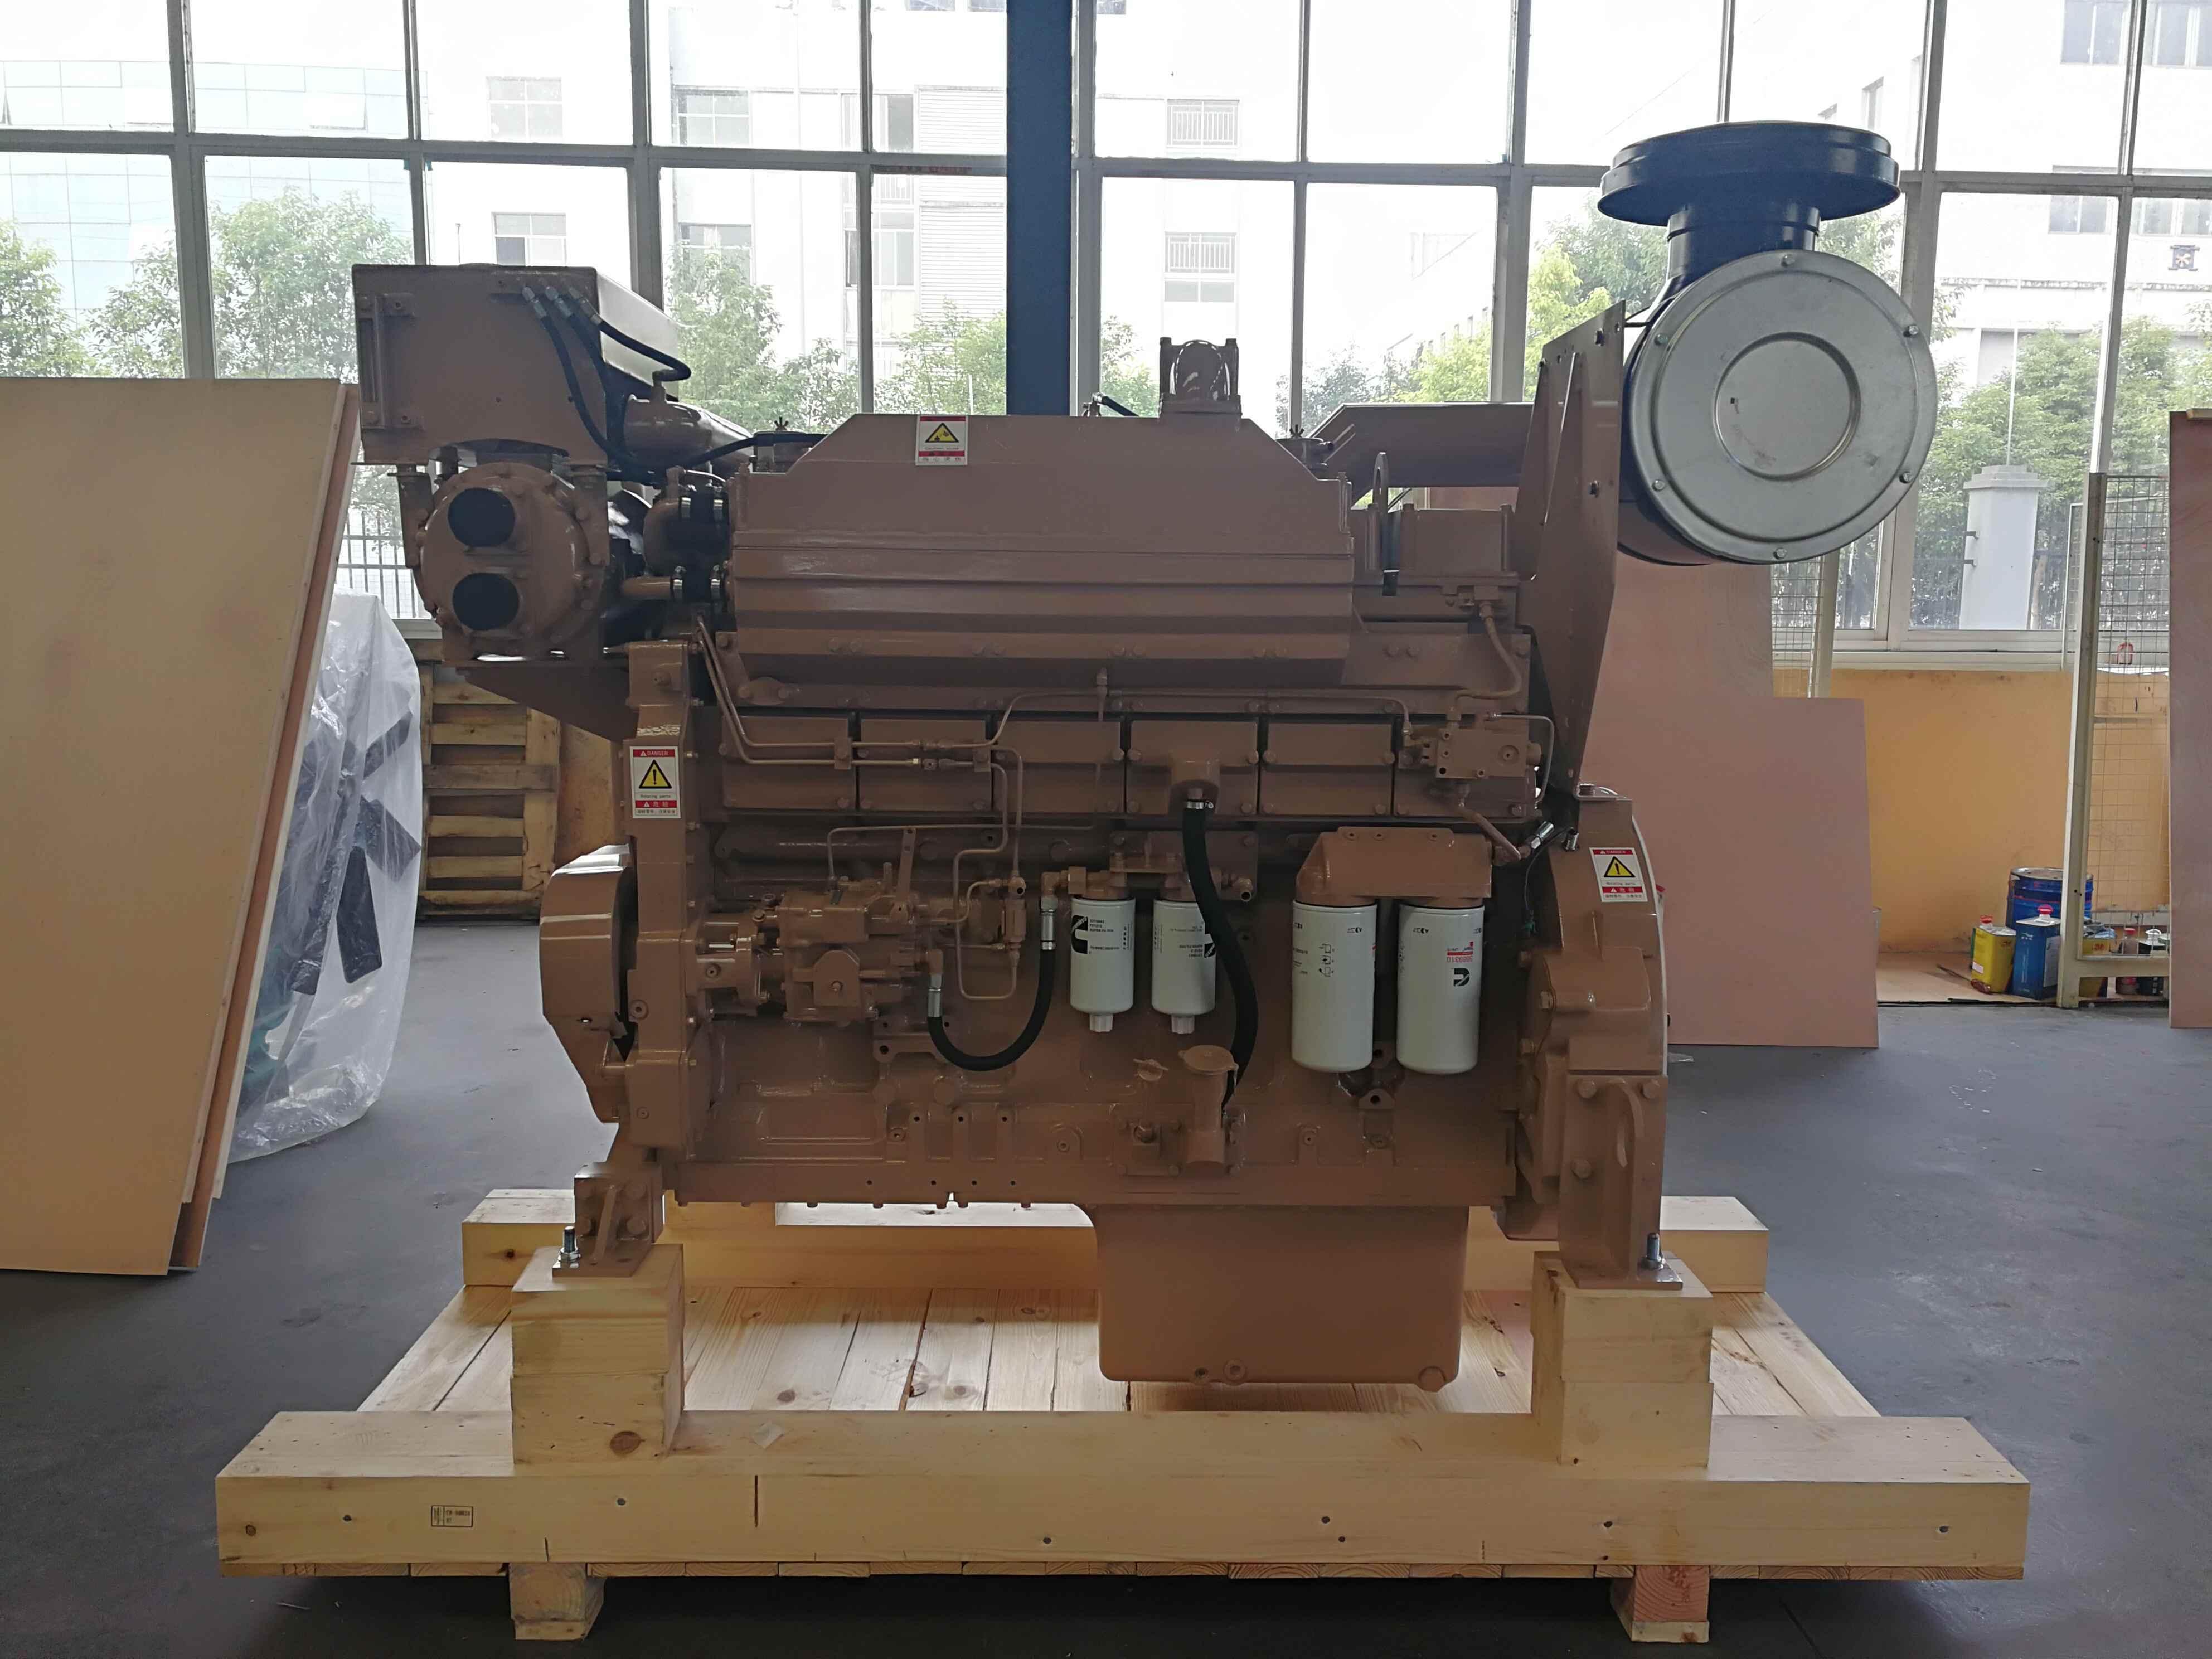 China Cummins Marine Diesel Engine for Boat/Ship/Vessel - China Cummins  Marine Engine, Marine Diesel Engine